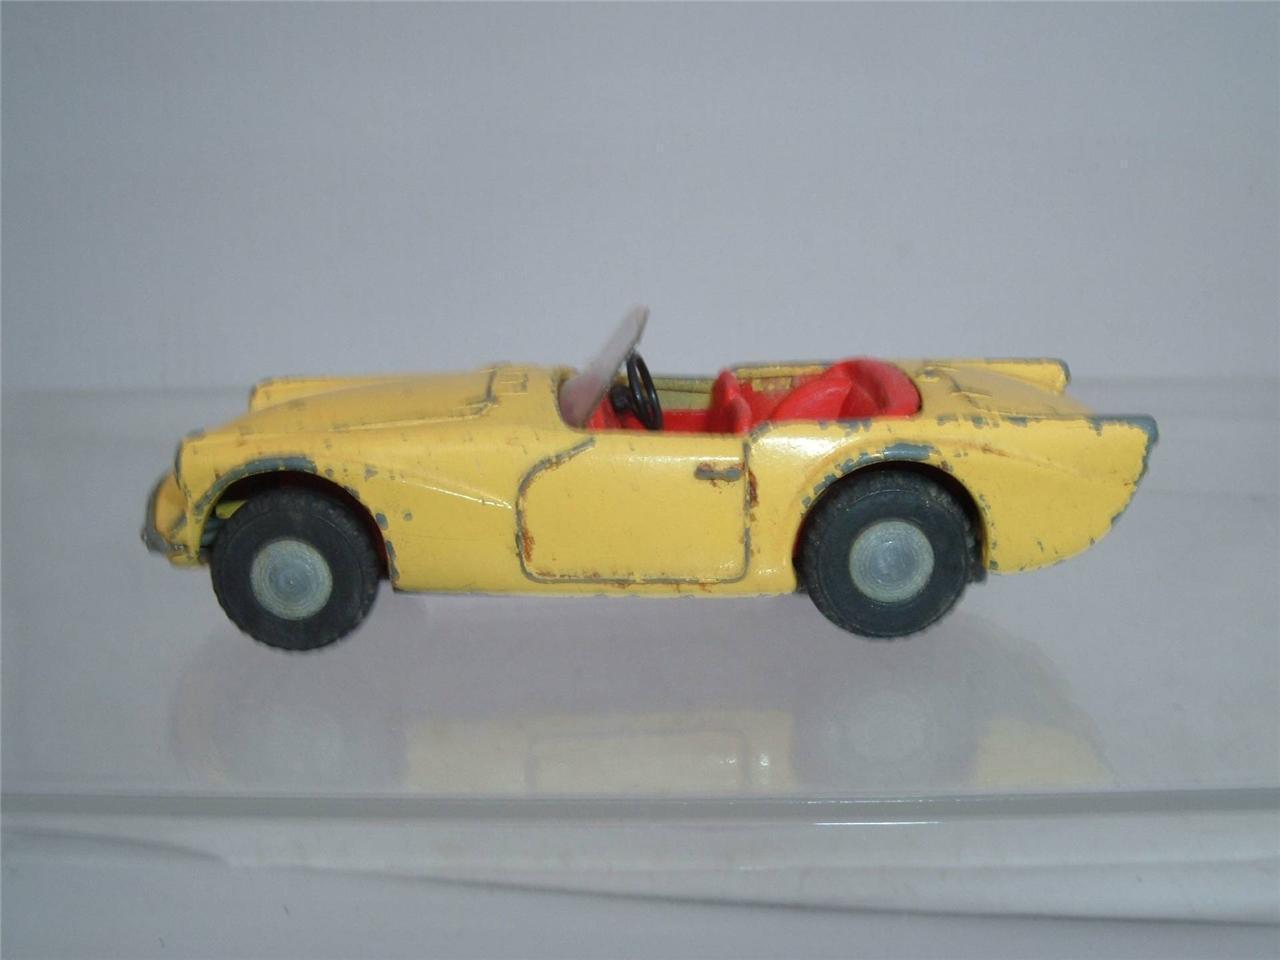 Spot on Daimler Dart jaune écran & steeringwheel remplacé voir les photos